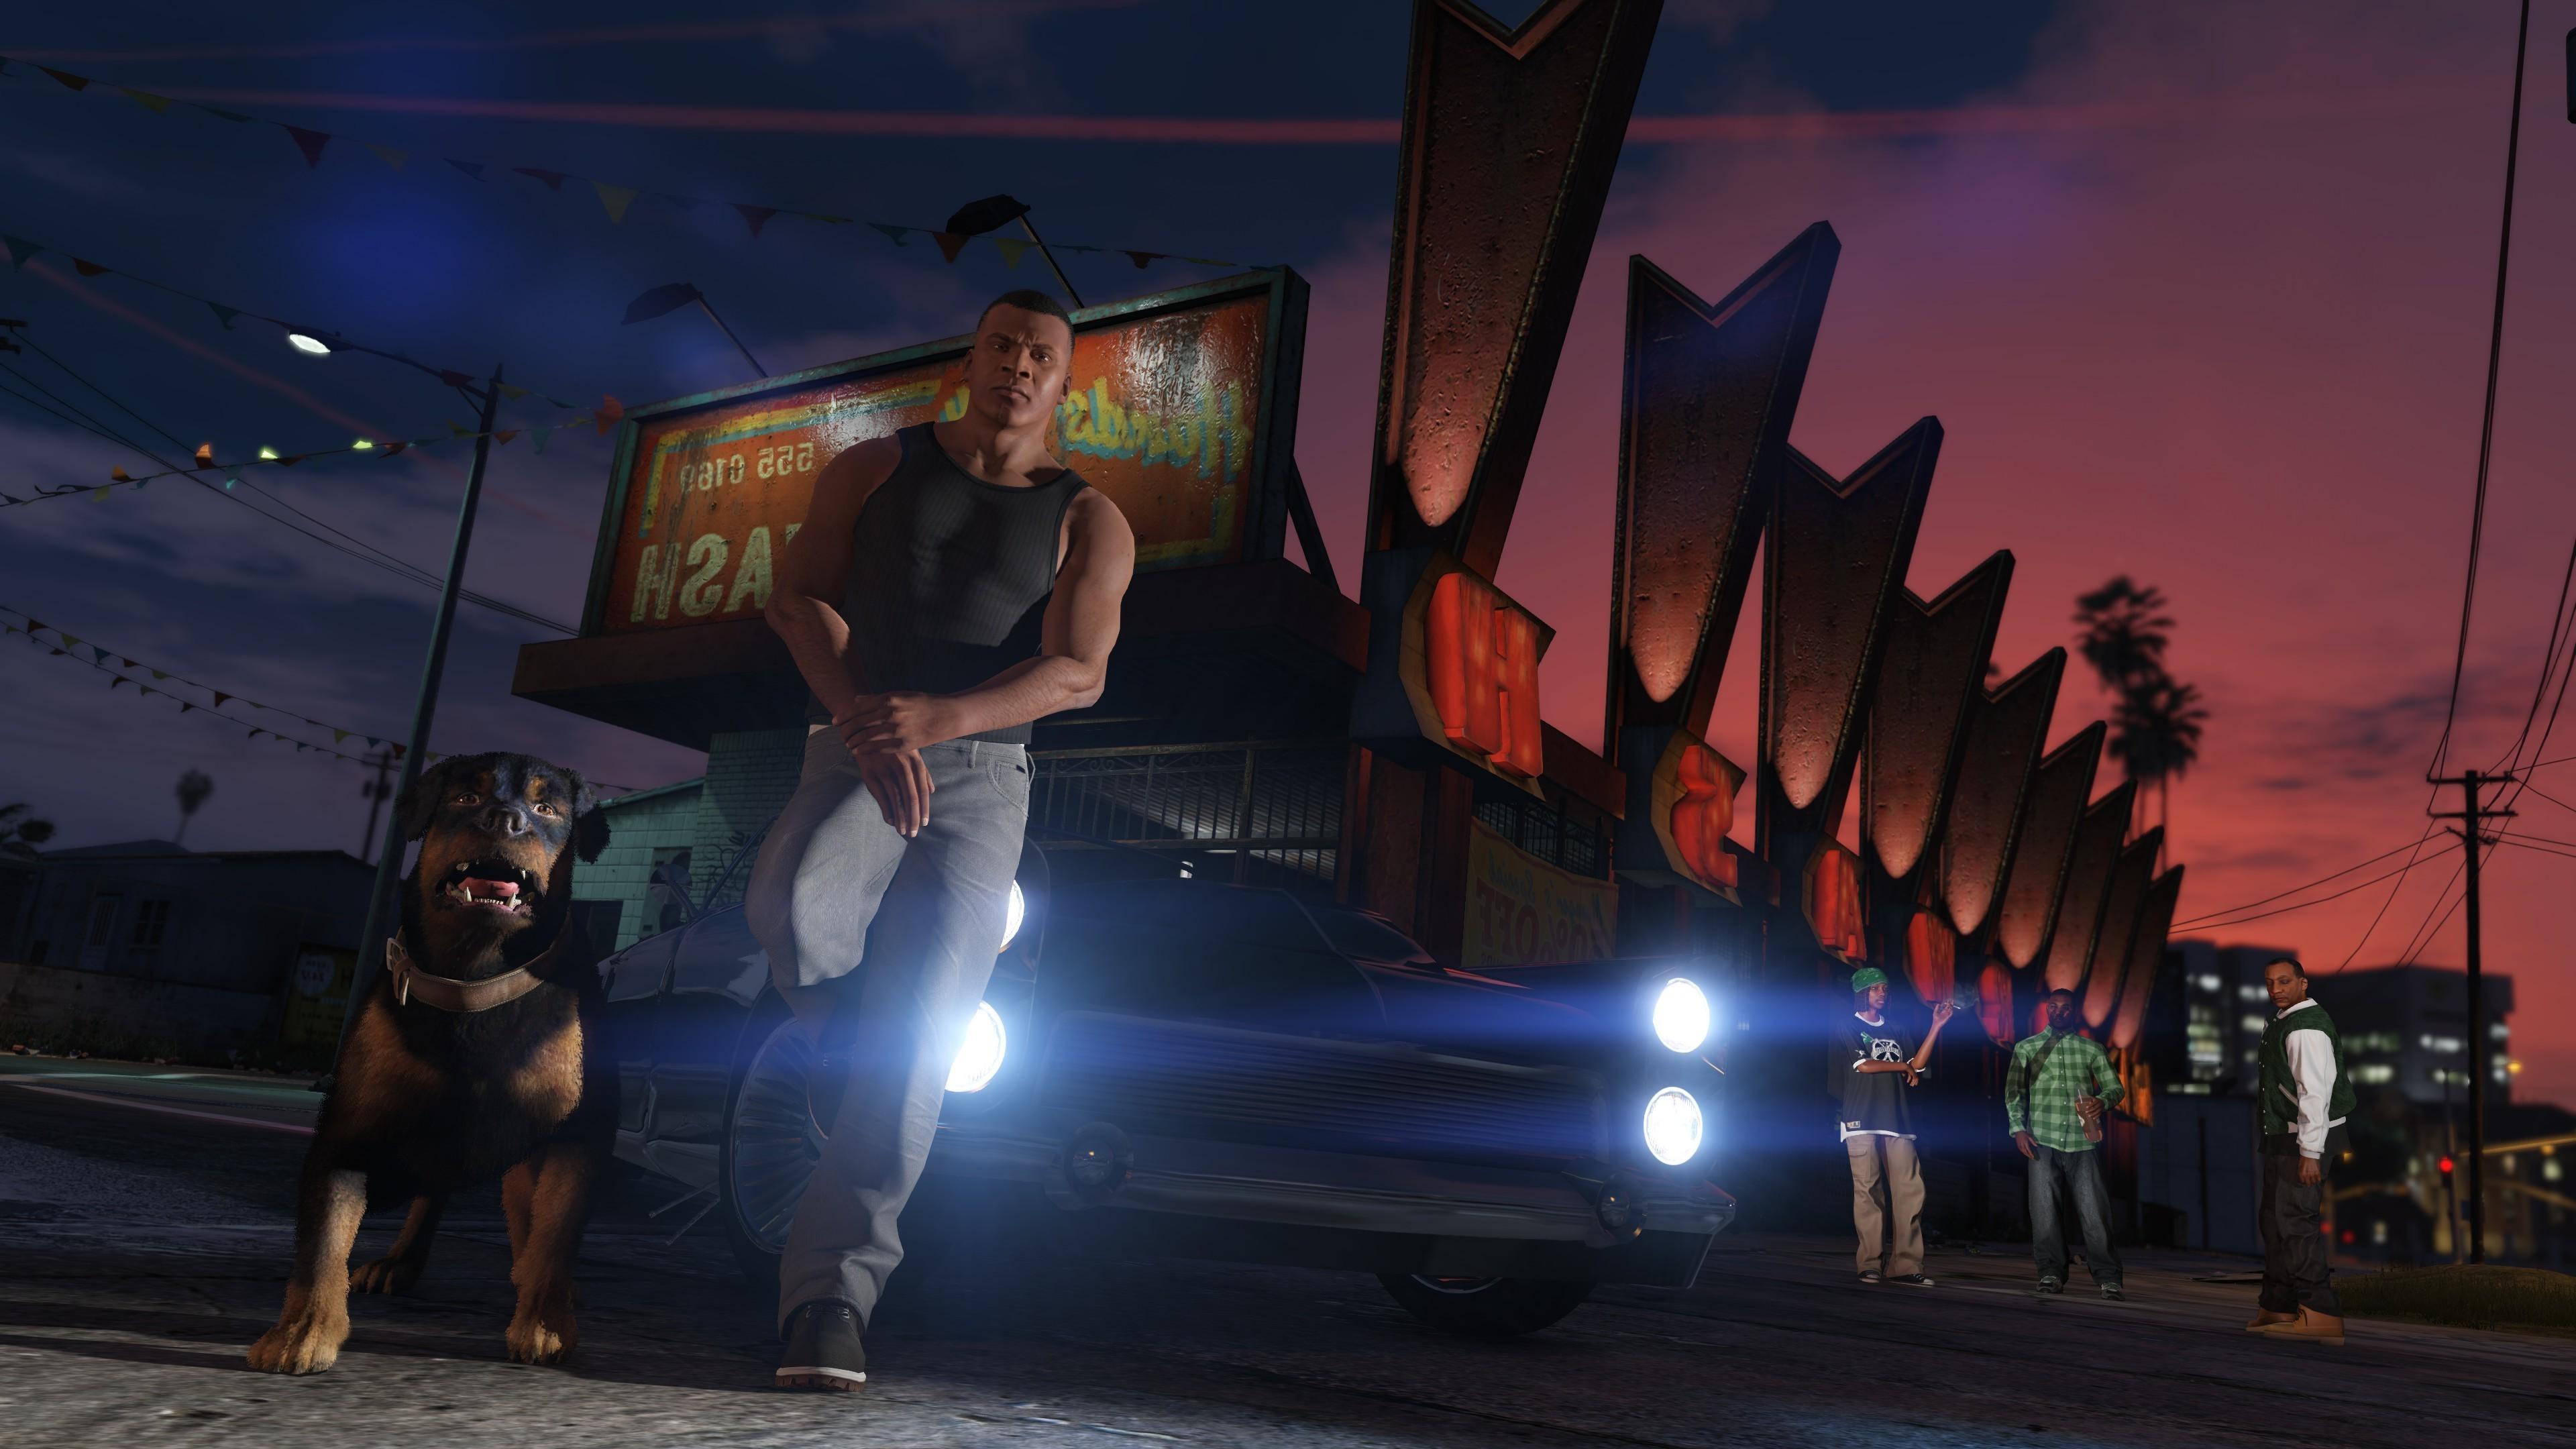 Amazing Wallpaper Night Evening - night-evening-Grand-Theft-Auto-V-PC-gaming-Rockstar-Games-Grand-Theft-Auto-V-PC-screenshot-3840x2160-px-musical-theatre-564329  Trends-38774.jpg